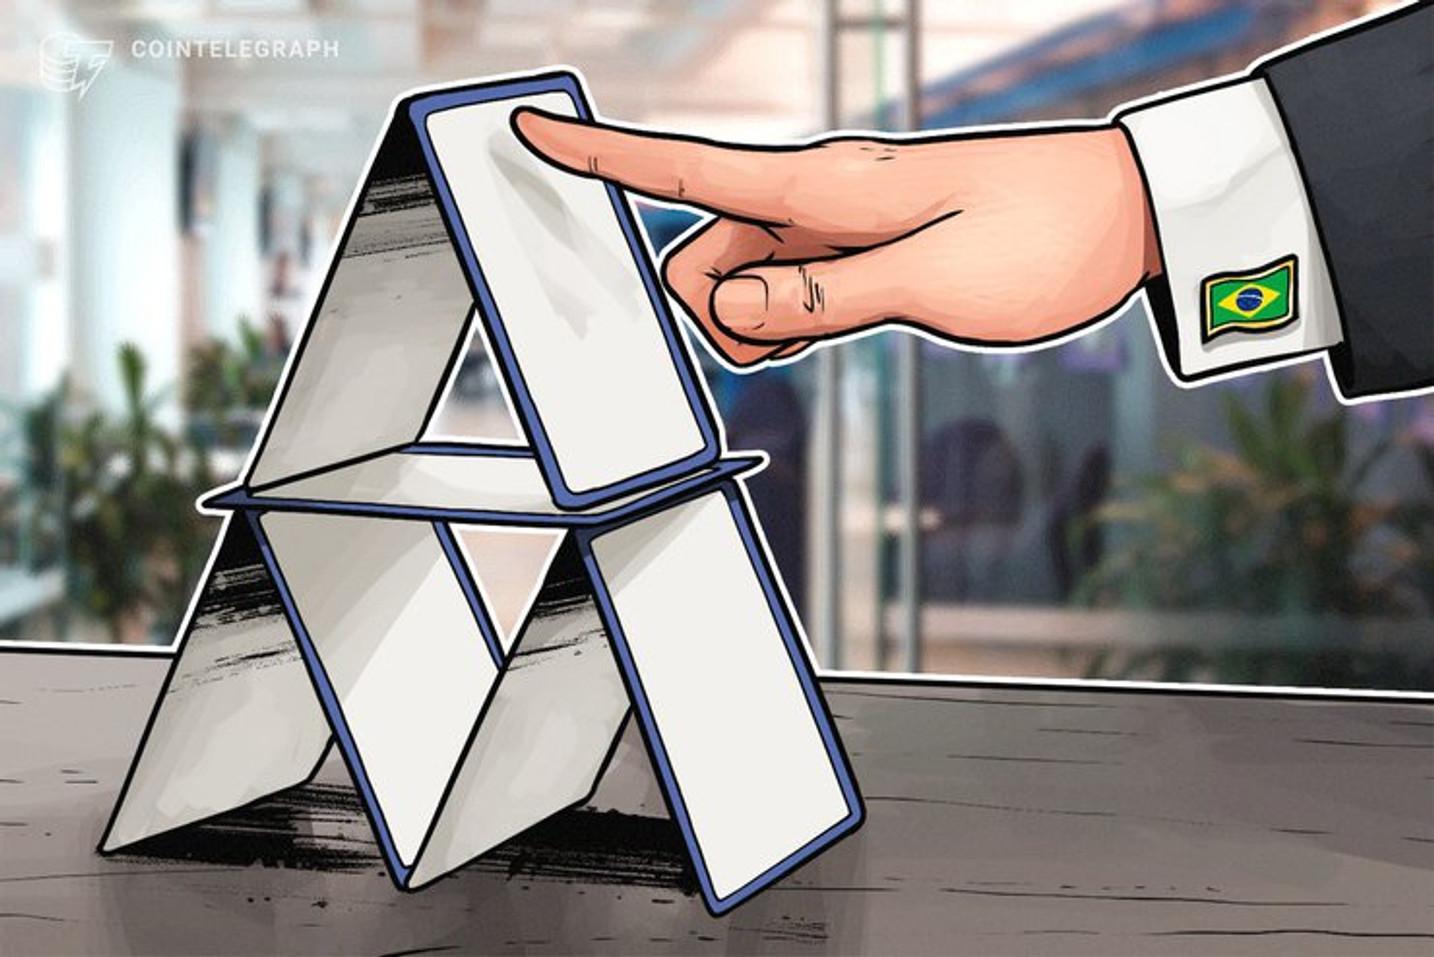 Investidores denunciam golpe com a Home Trader Coin, suposta pirâmide de Bitcoin